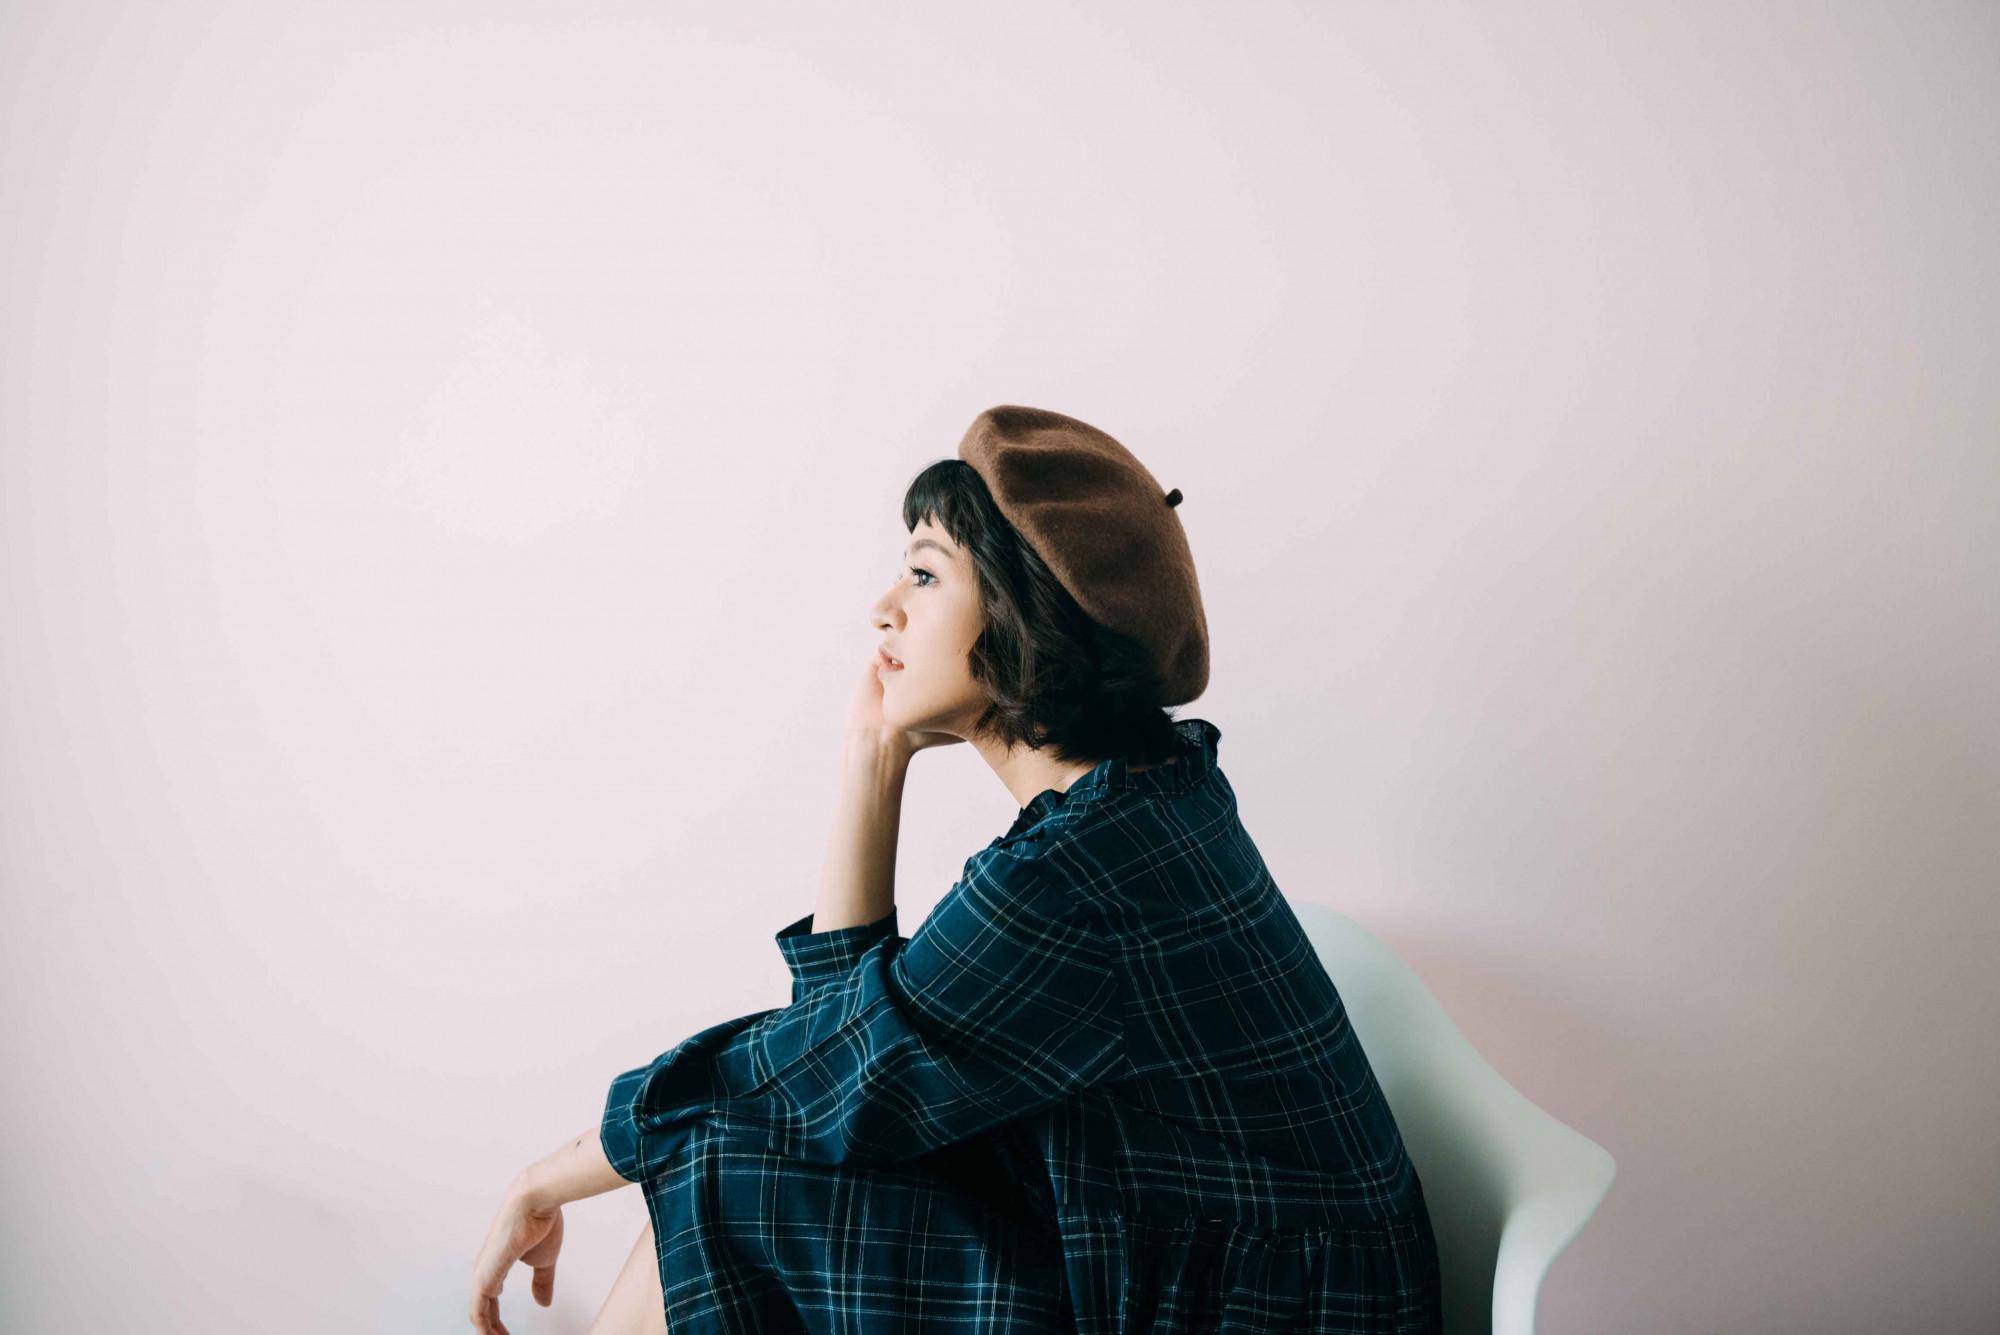 mujer-solitaria-pensativa